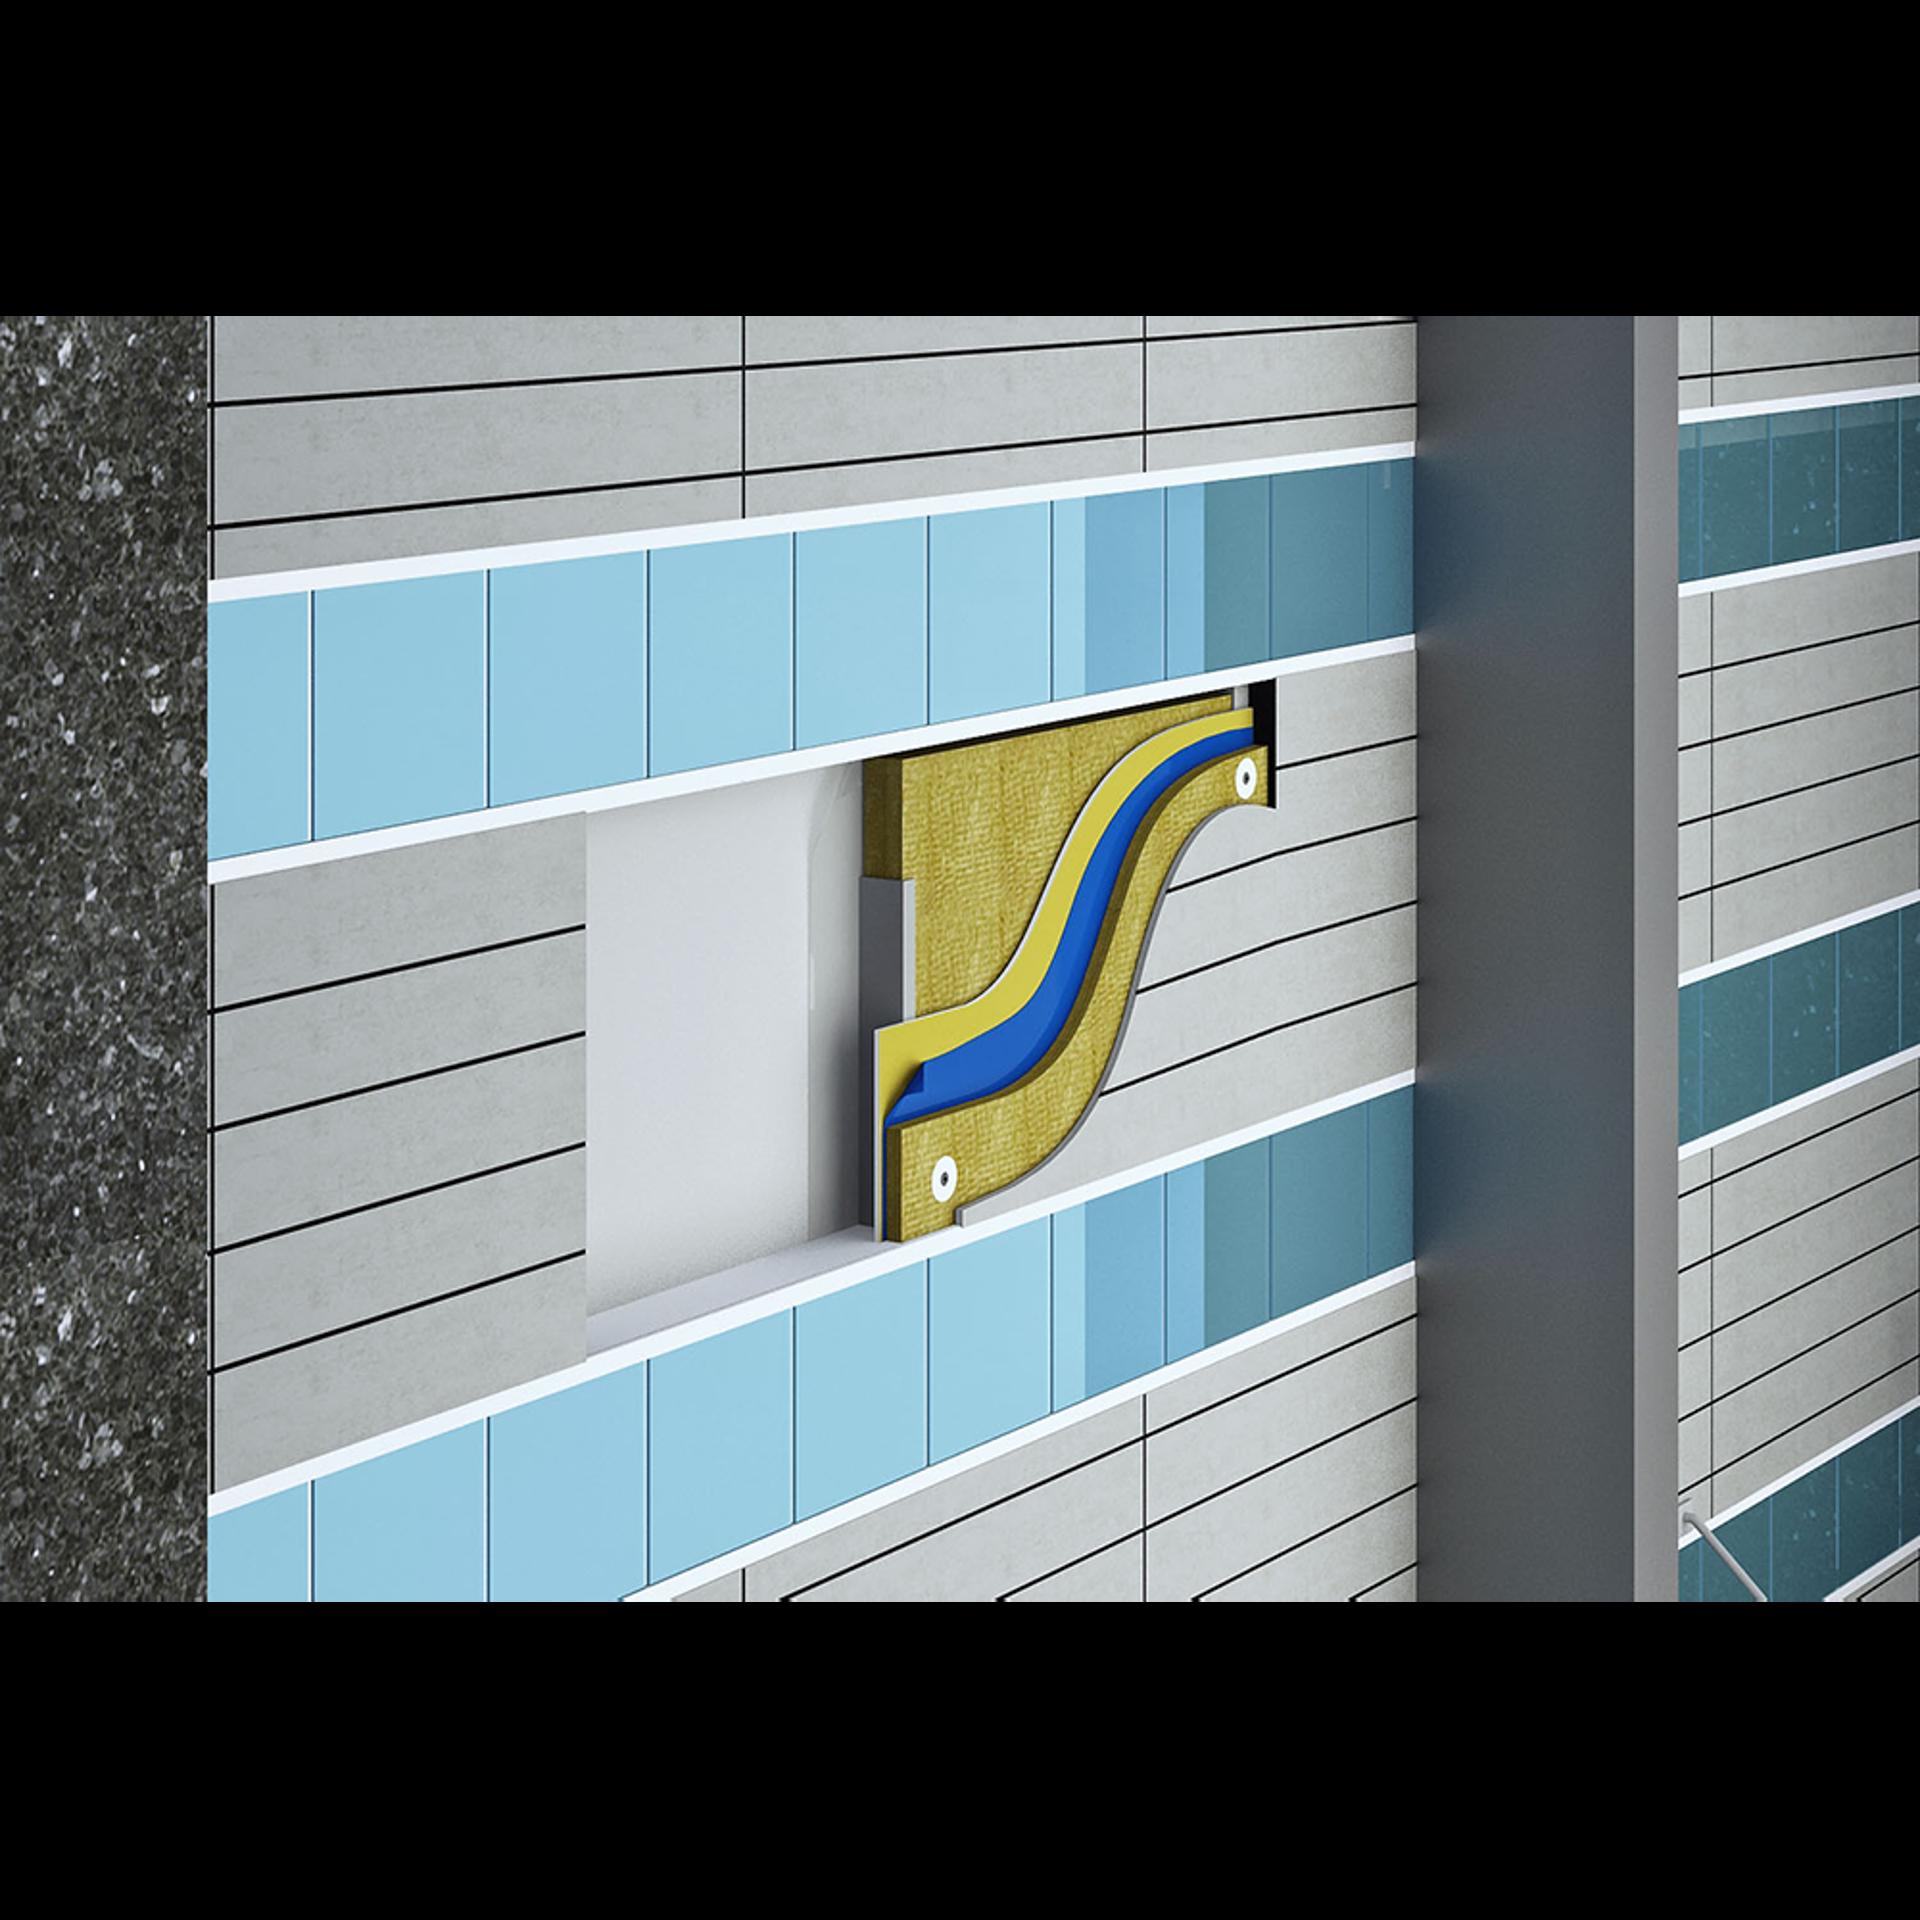 Rainscreen U0026 Cavity Wall Insulation